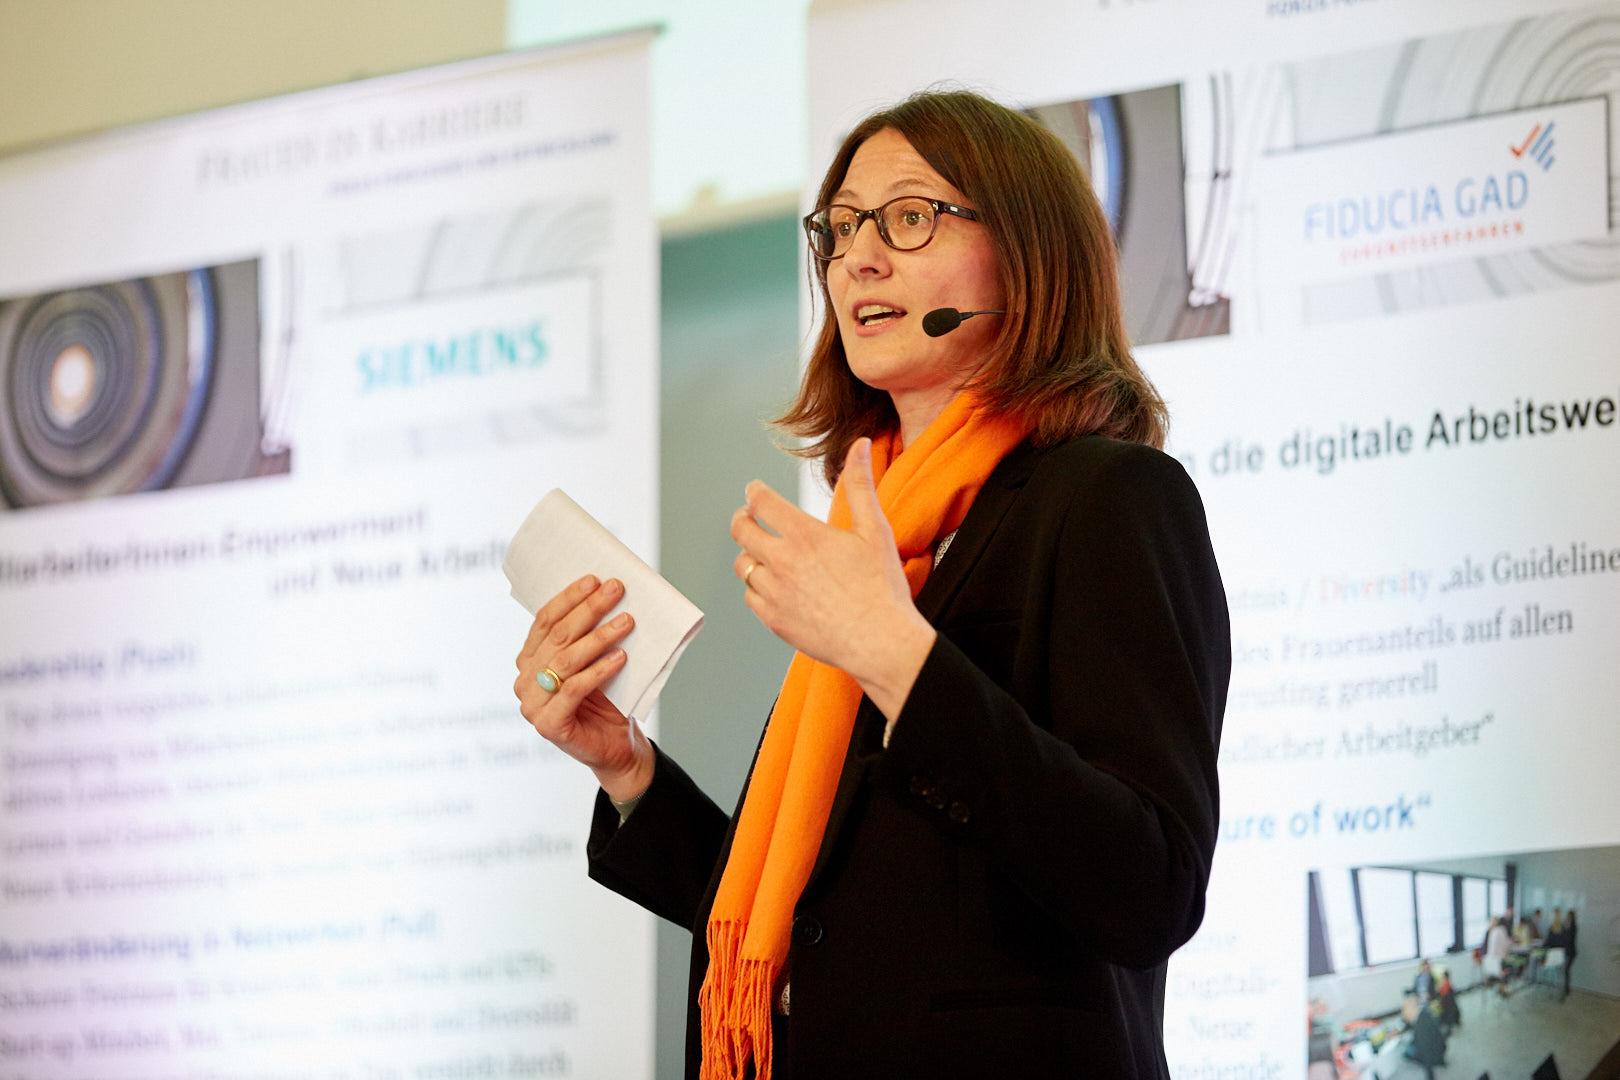 Dr. Elvire Meier-Comte